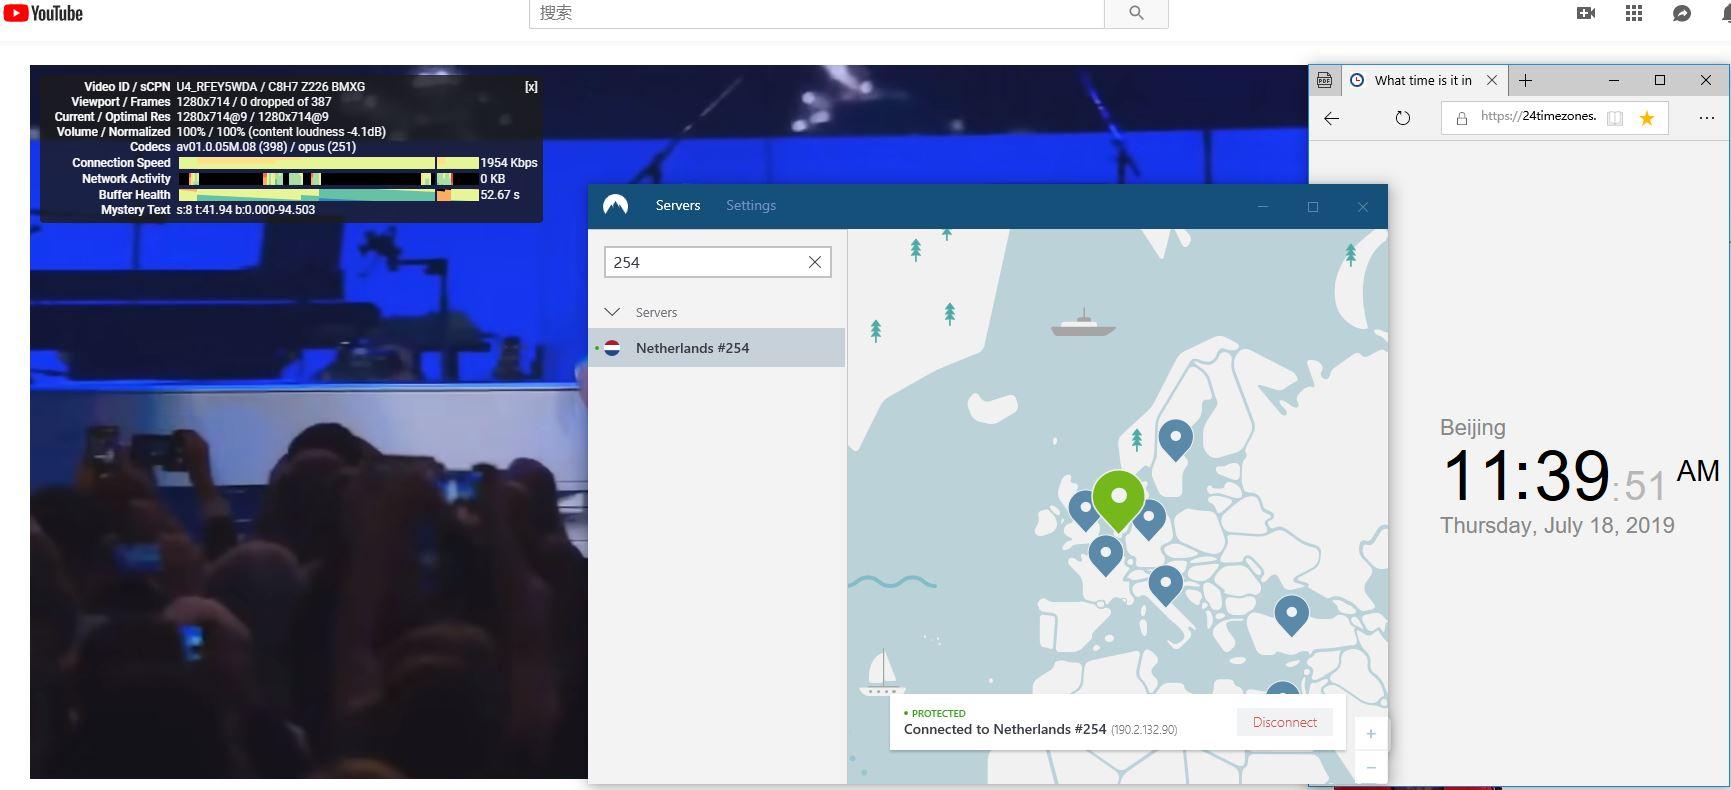 NordVPN Windows 翻墙 科学上午 荷兰-254服务器 YouTube速度测试-20190718